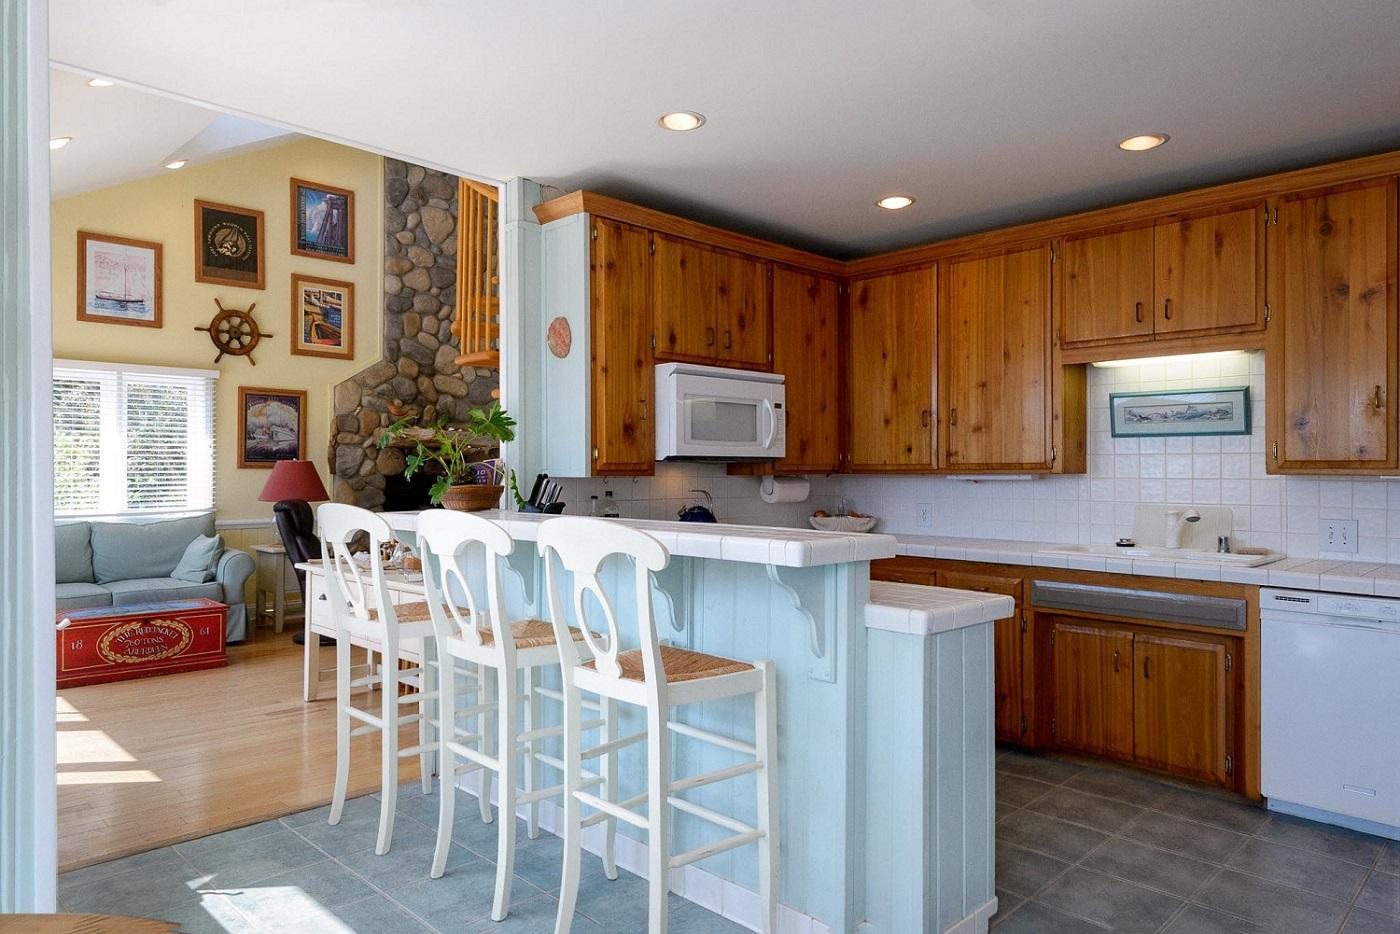 2310WhitneyAve_Kitchen.jpg